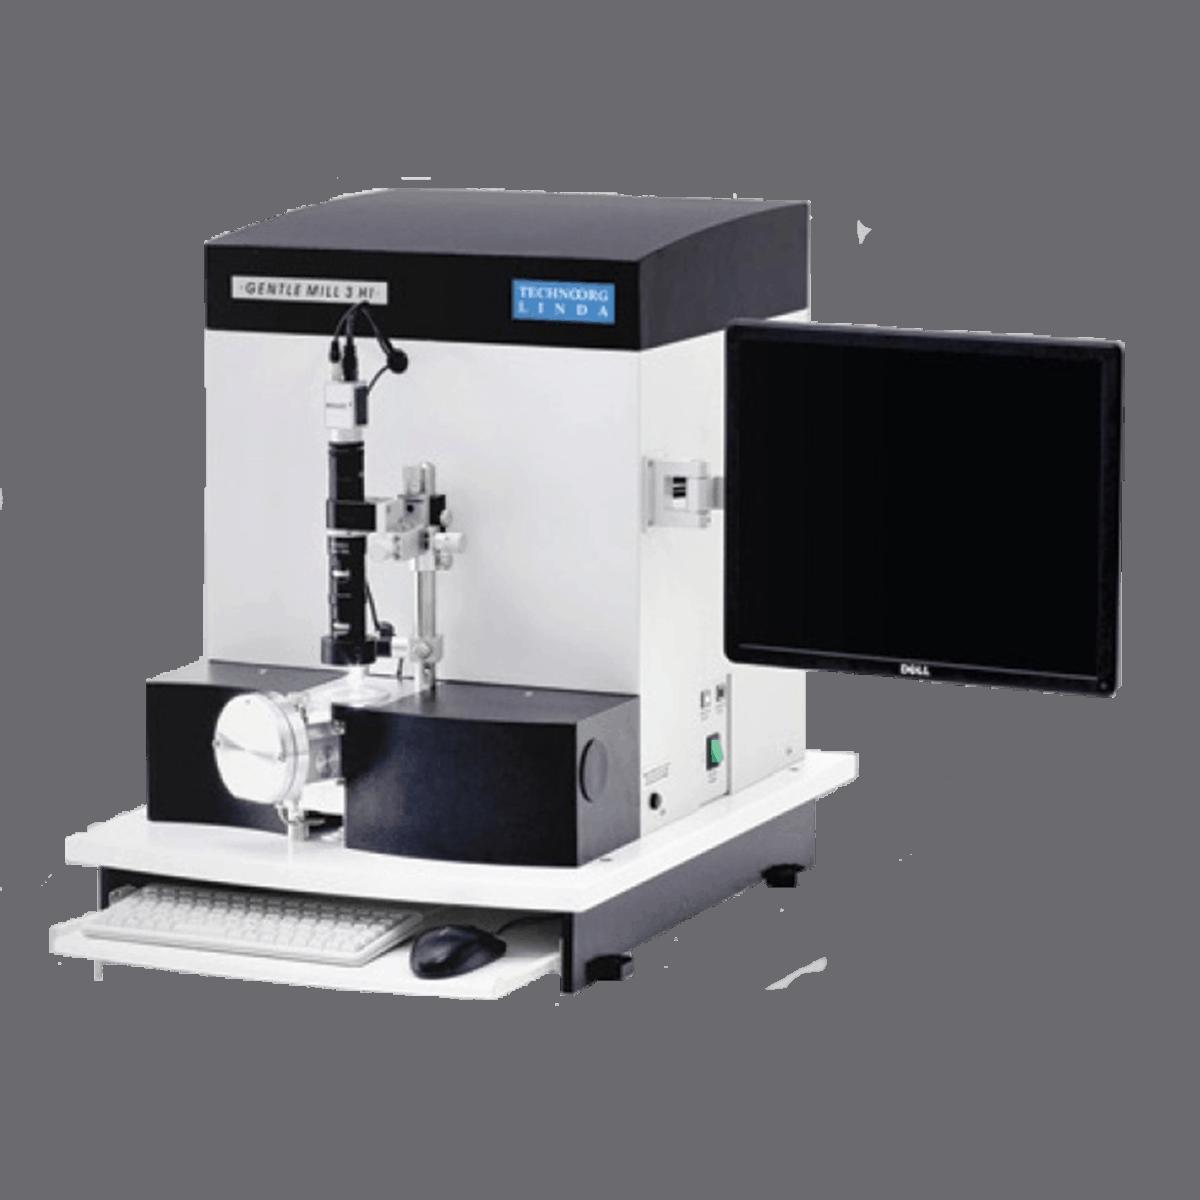 KCT-agent-technoorg-linda-ion-milling-system-gentlemill